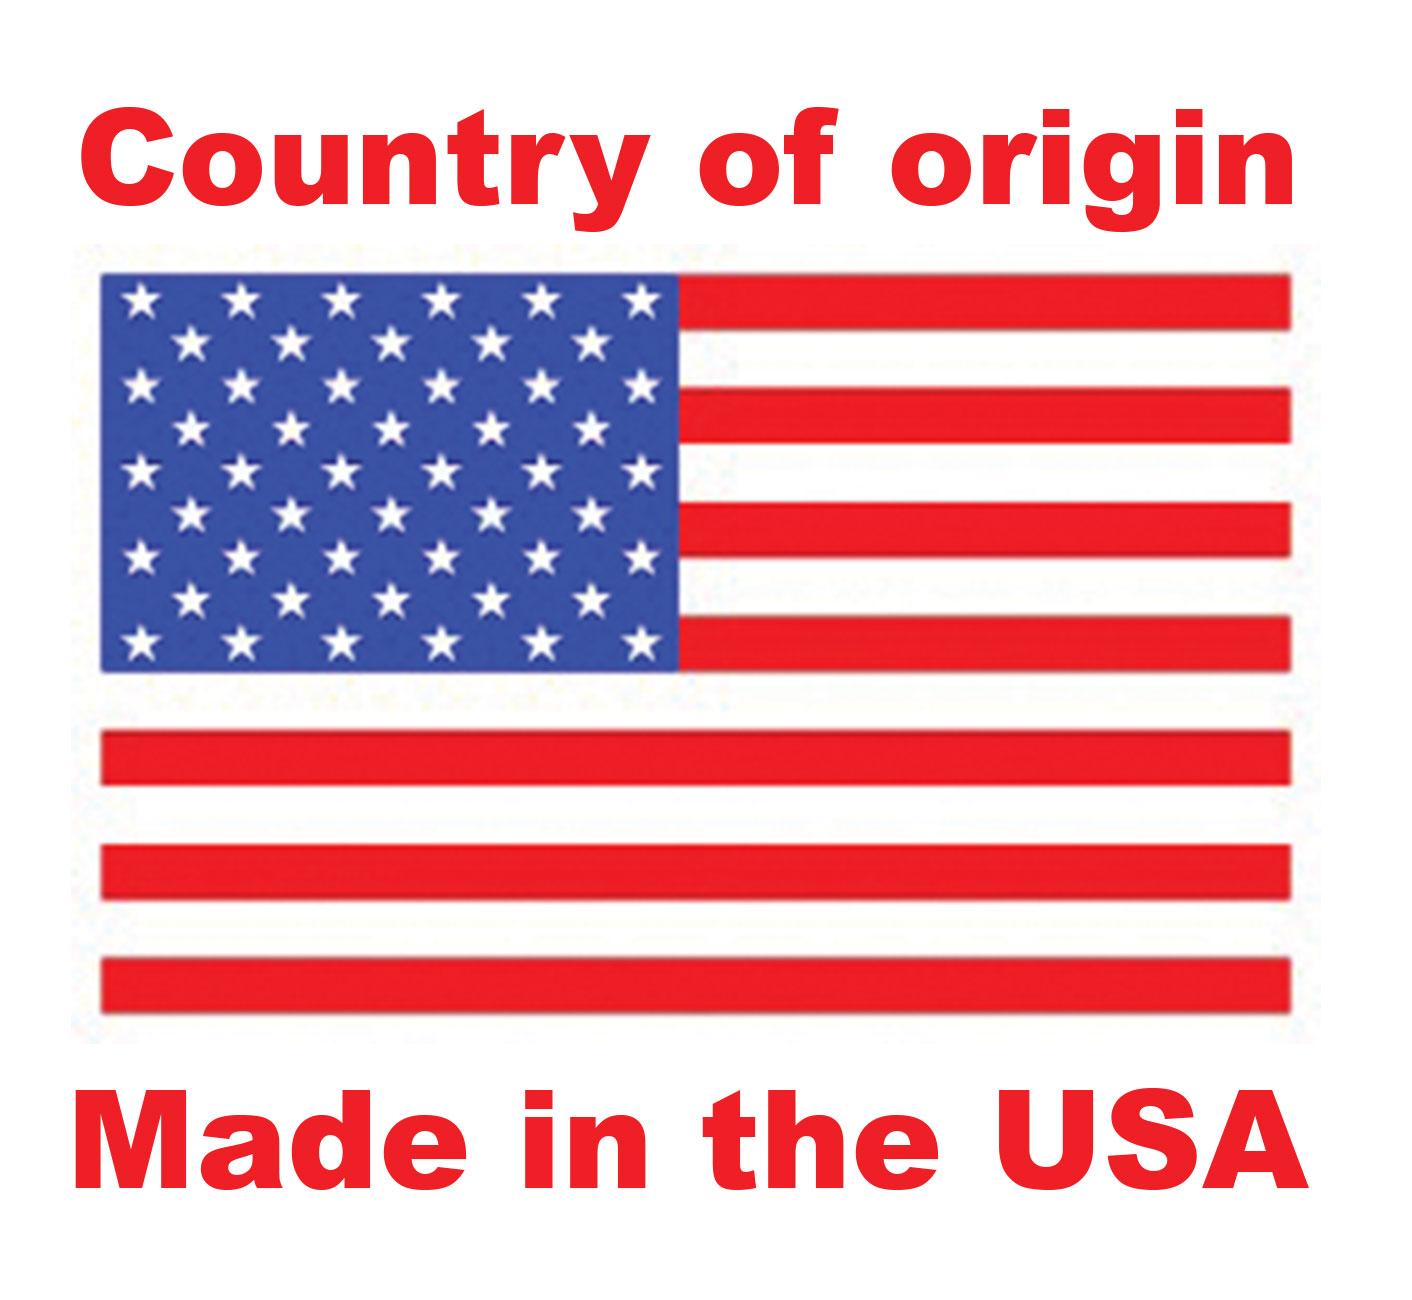 Made in the U.S.A.